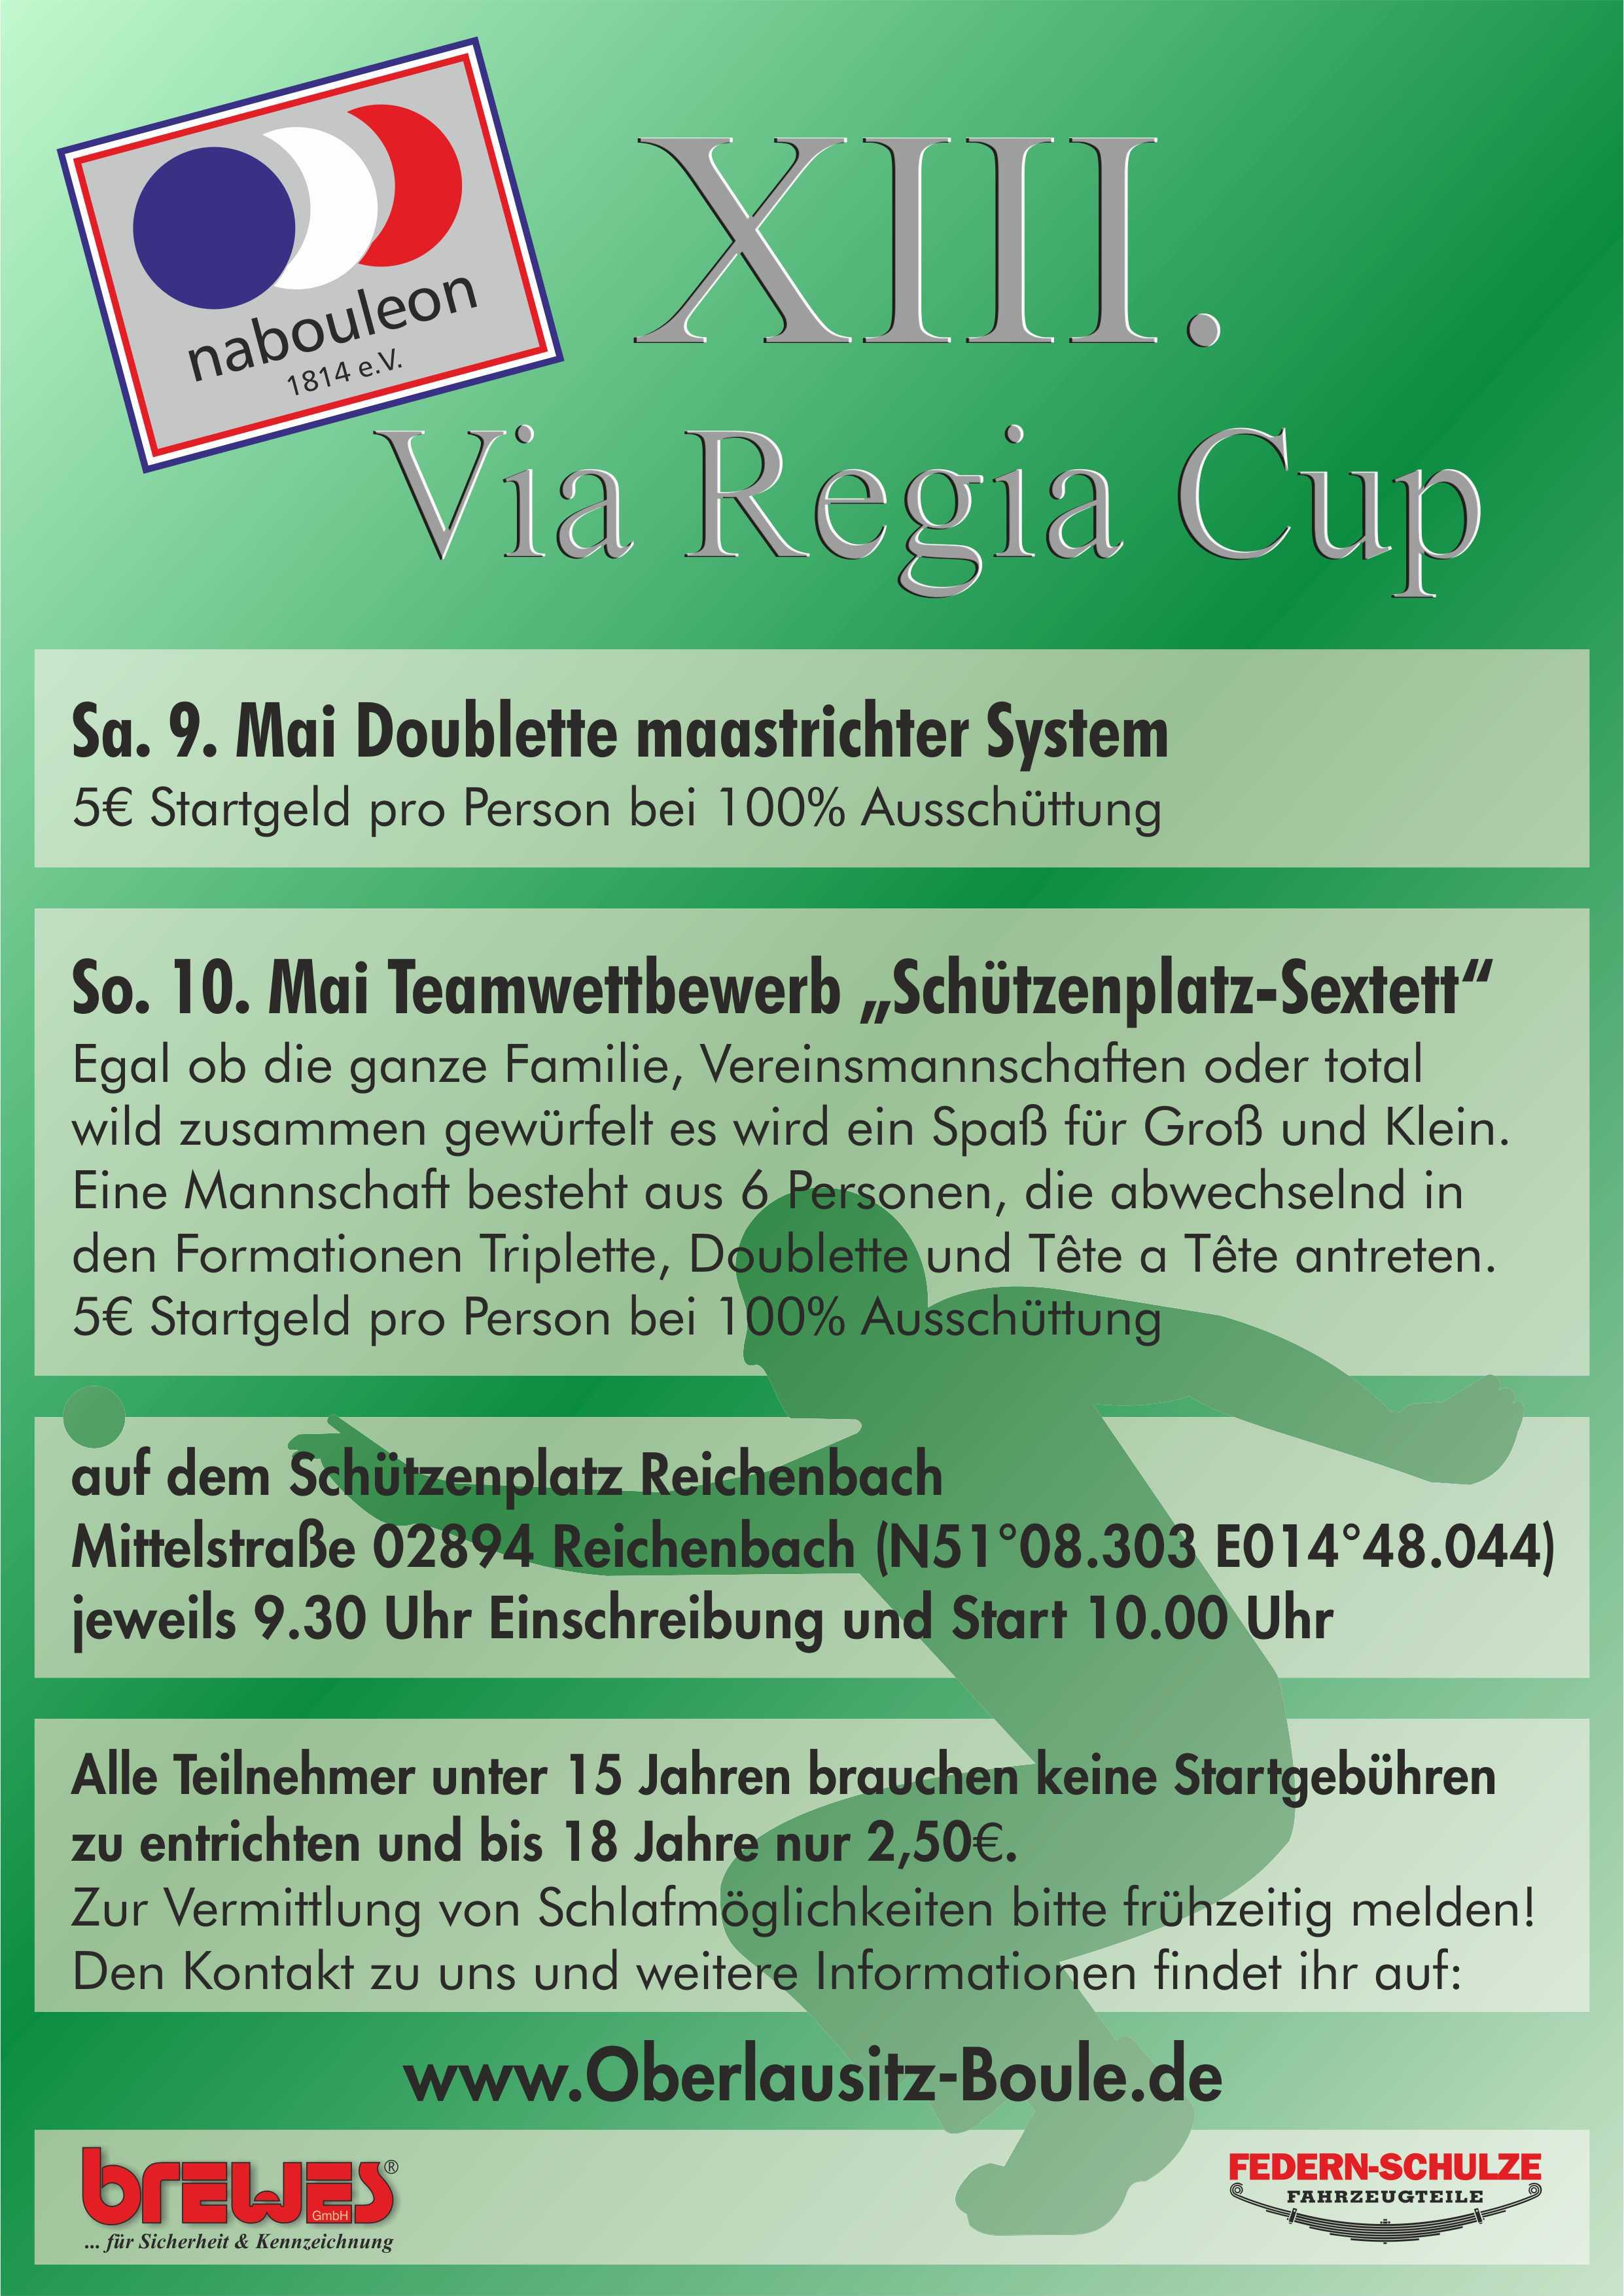 12. Via Regia Cup 2014 Plakat